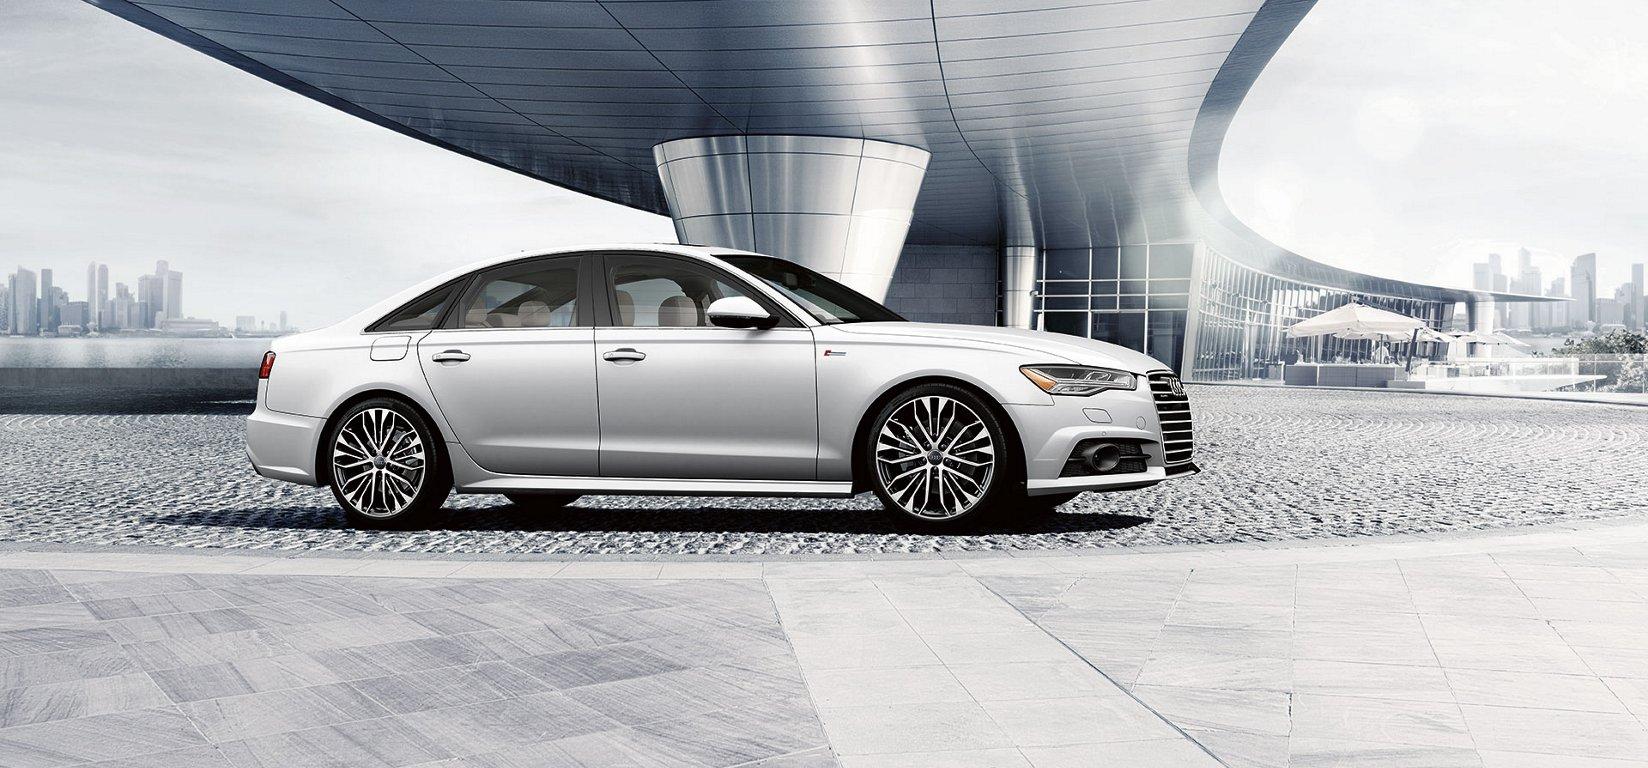 New Audi A6 Exterior main image